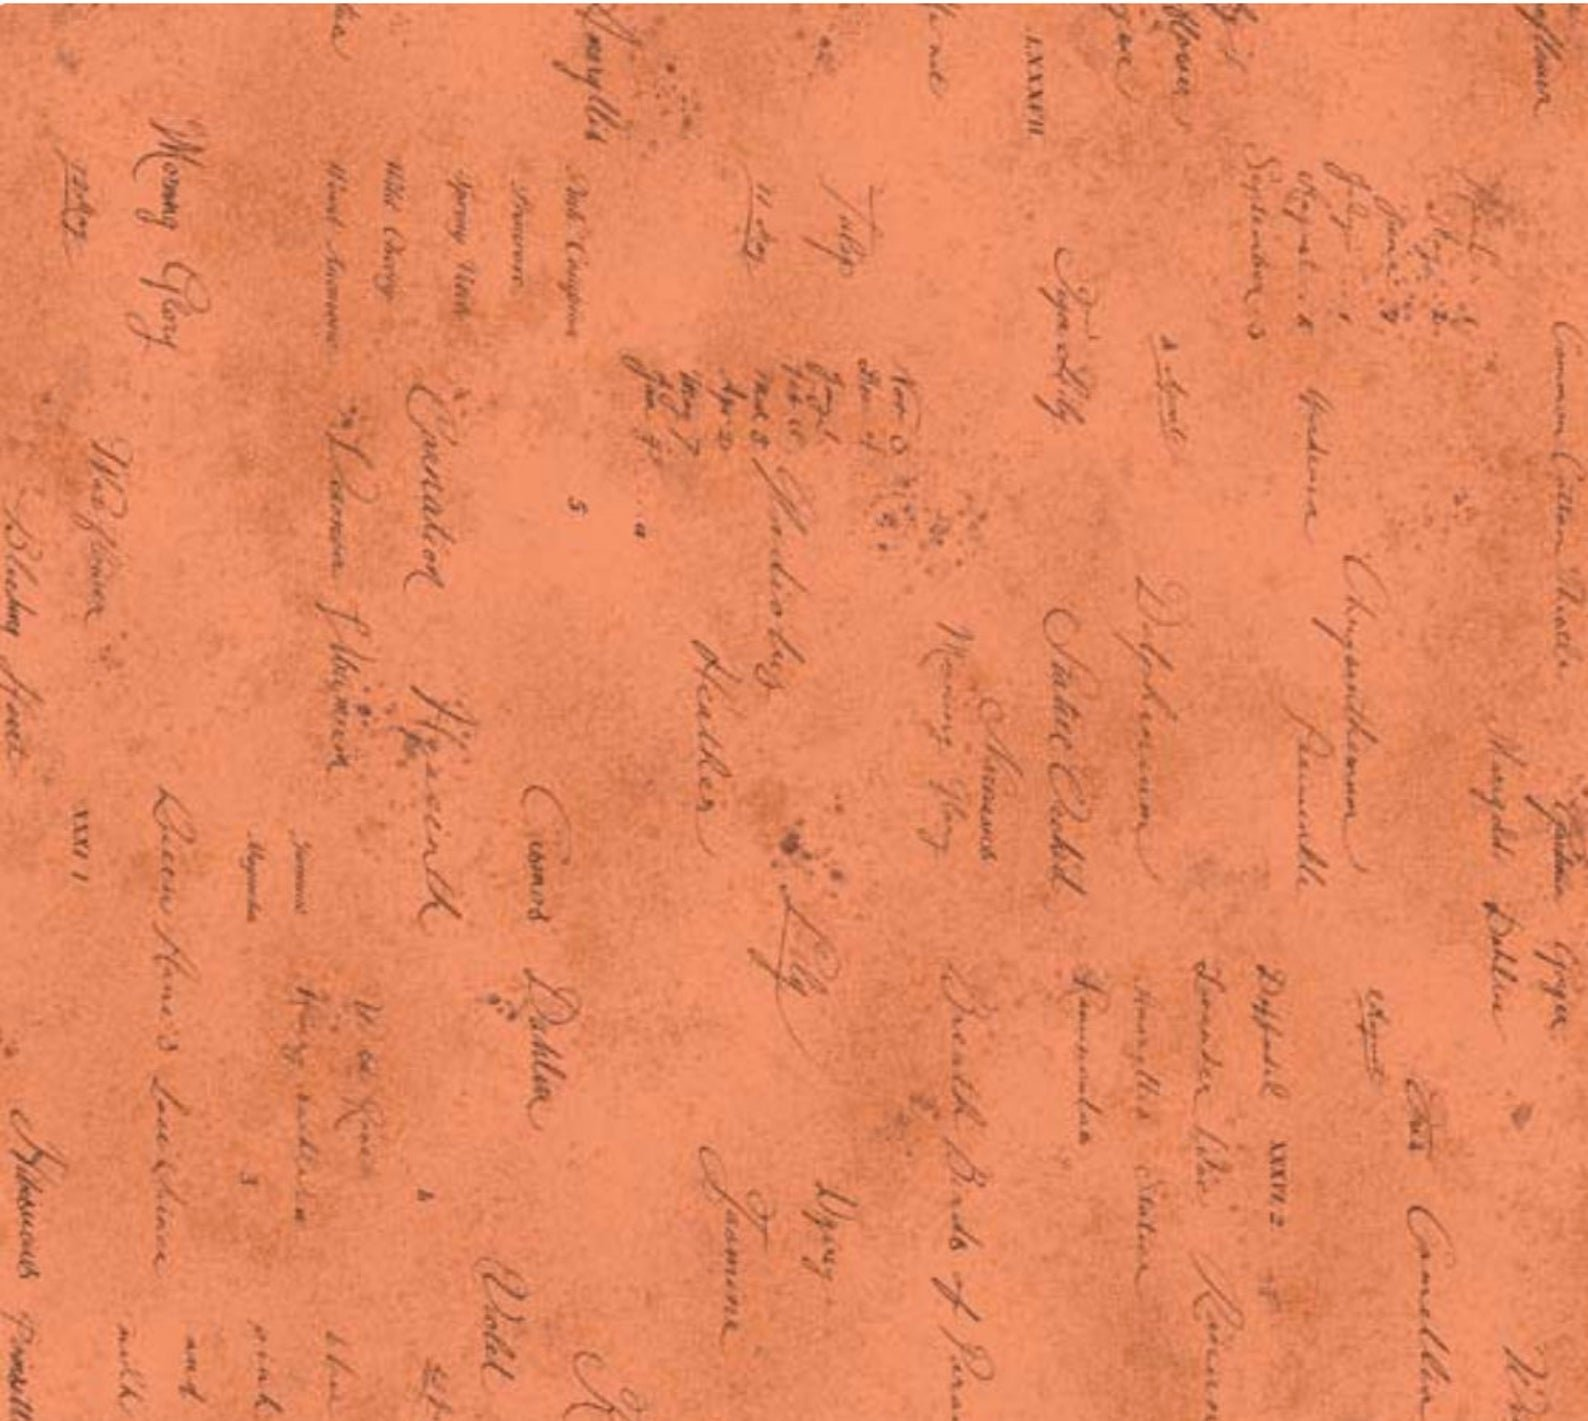 Memoire A Paris 820819-40 Script on orange